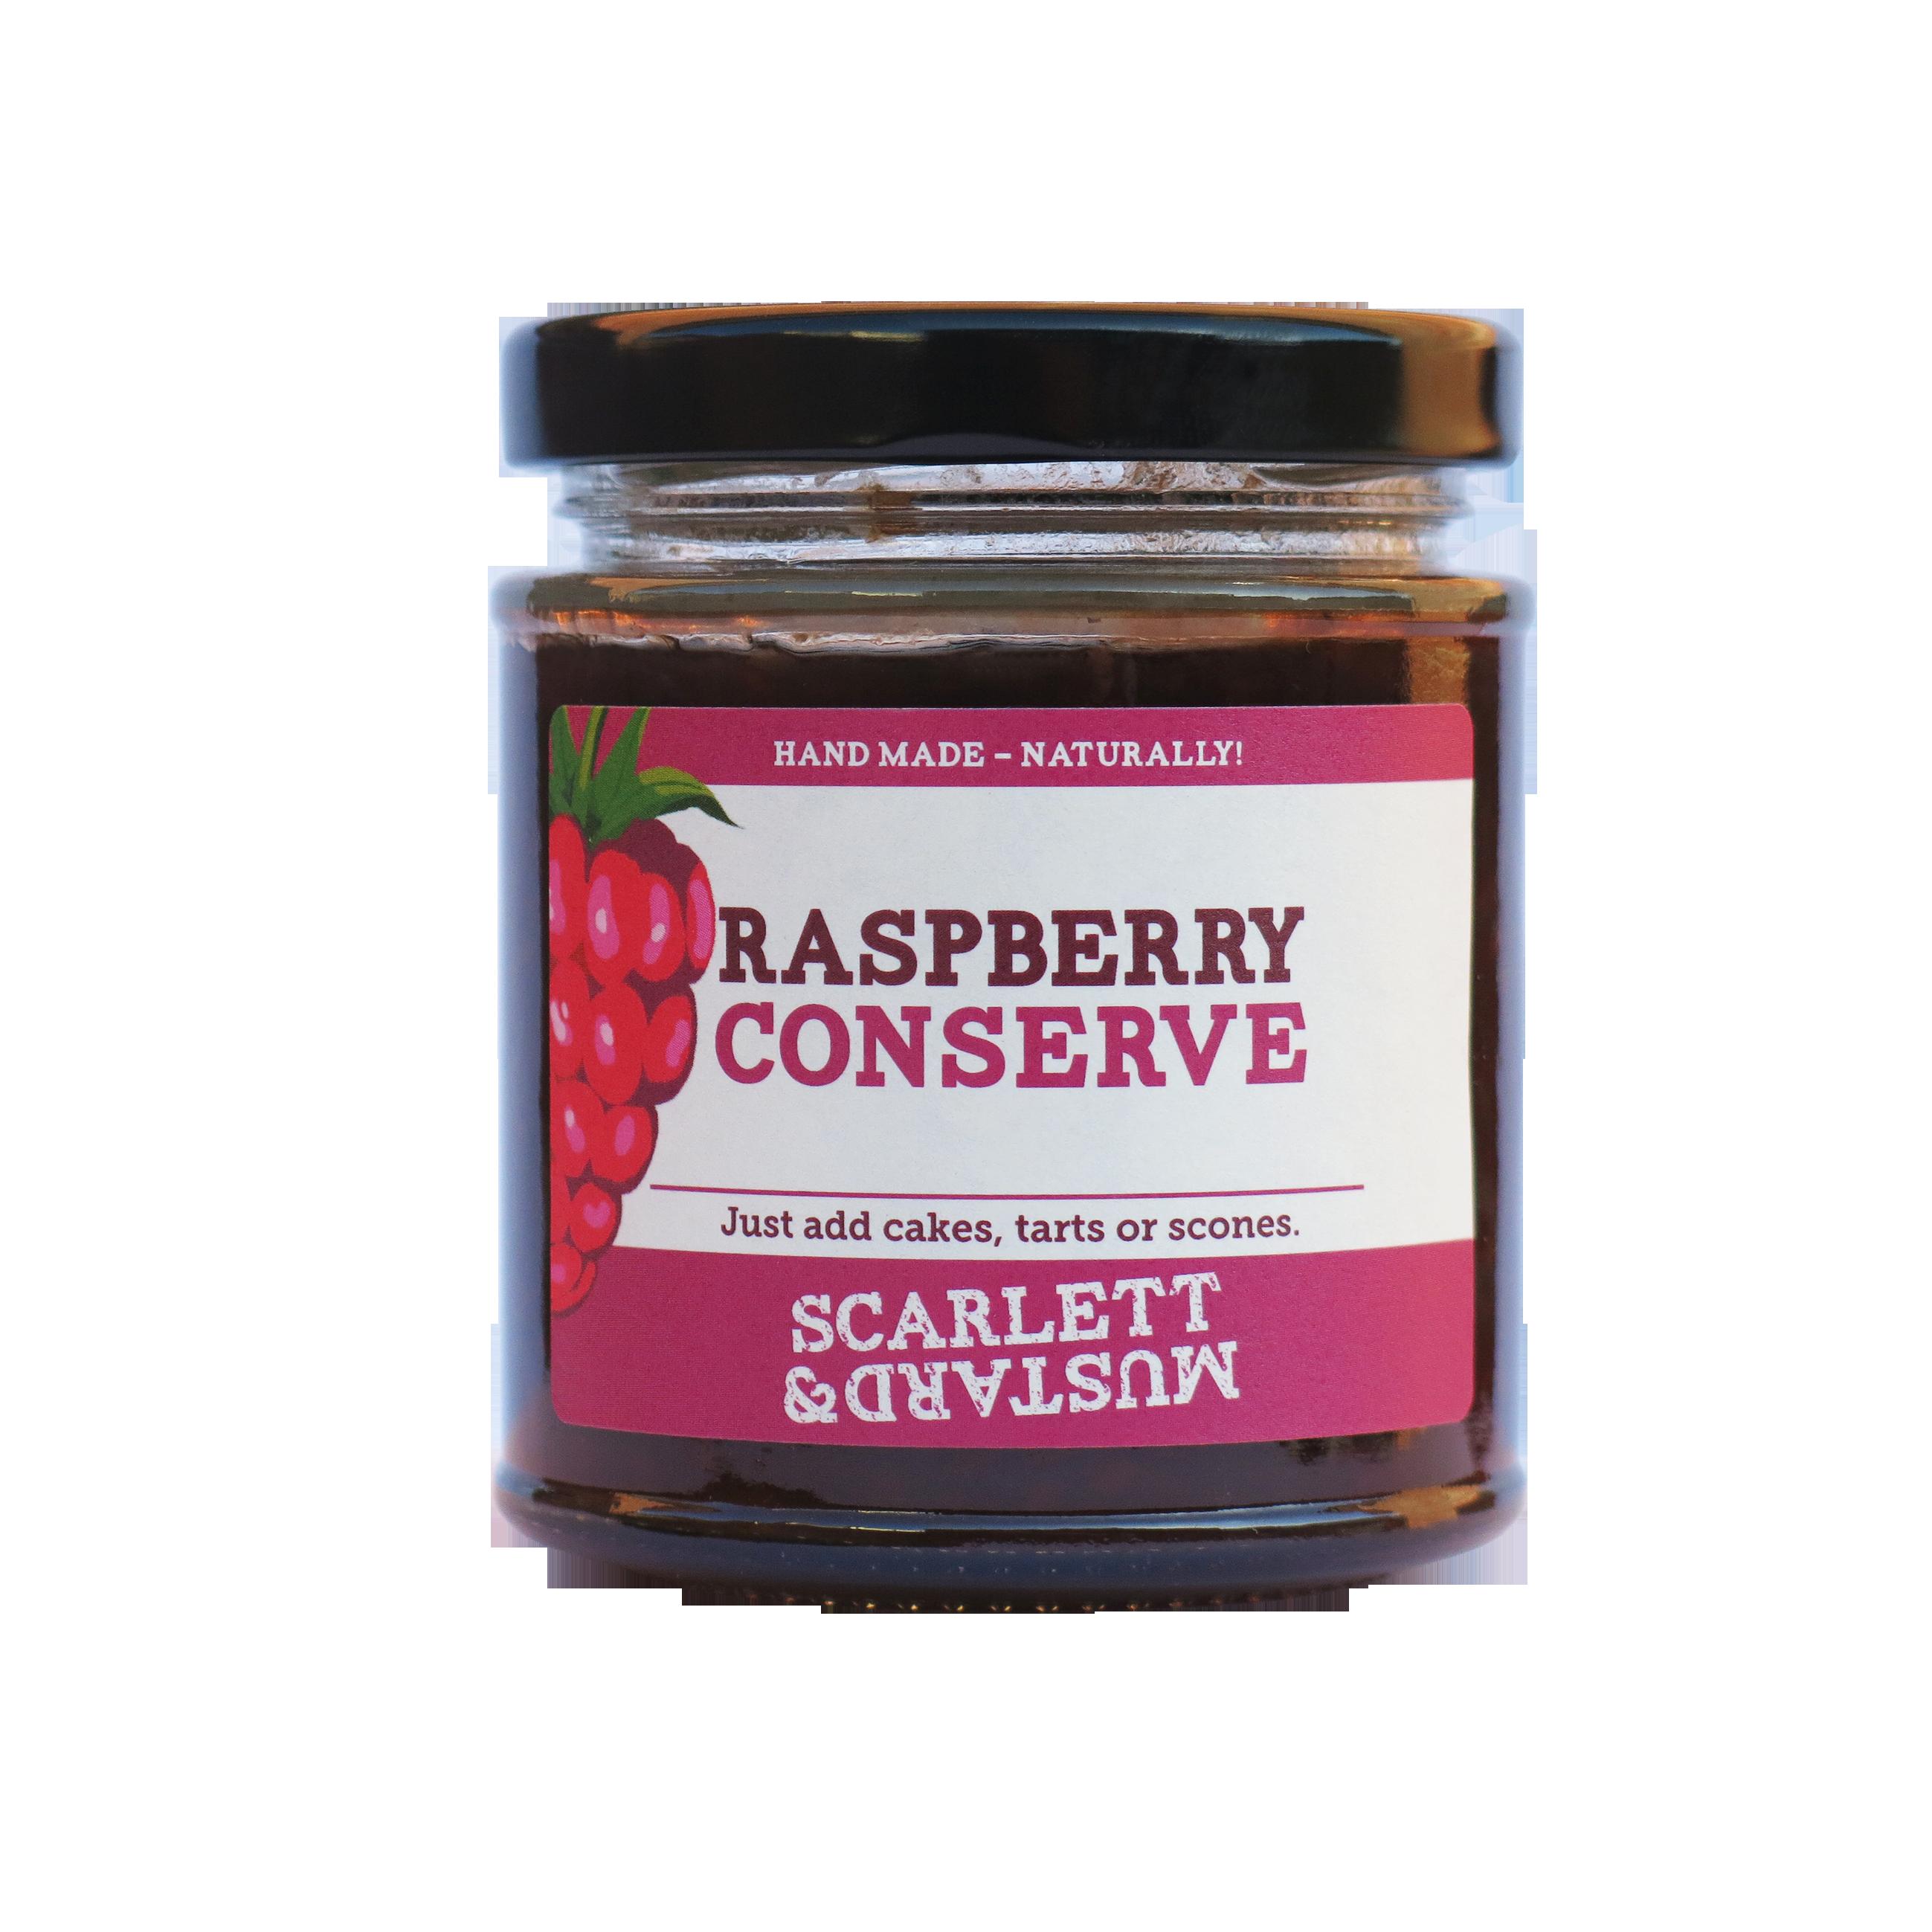 Scarlett & Mustard Raspberry Conserve